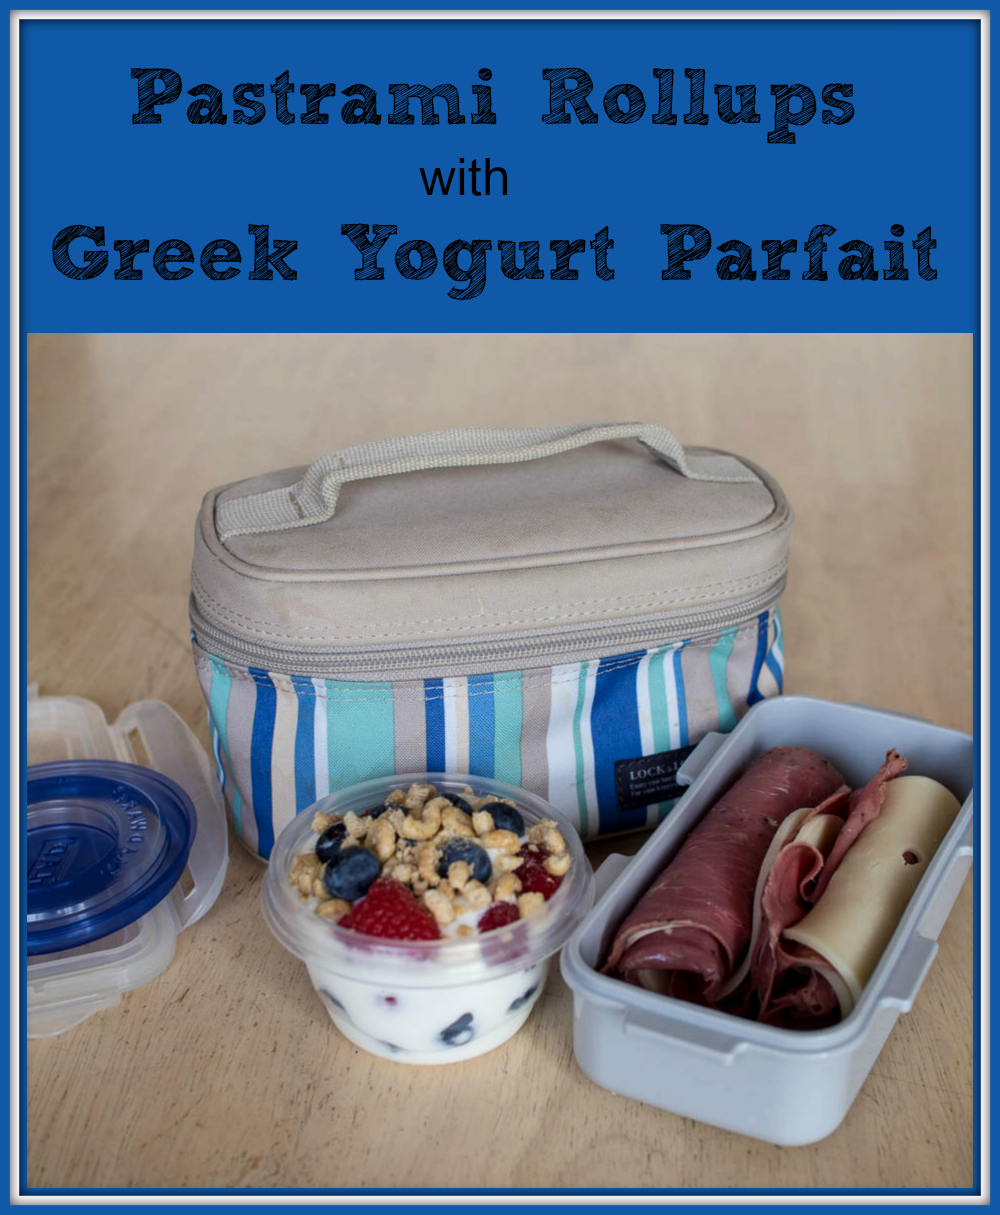 Pastrami Rollups with Greek Yogurt Parfait #PriceChopperB2S #shop